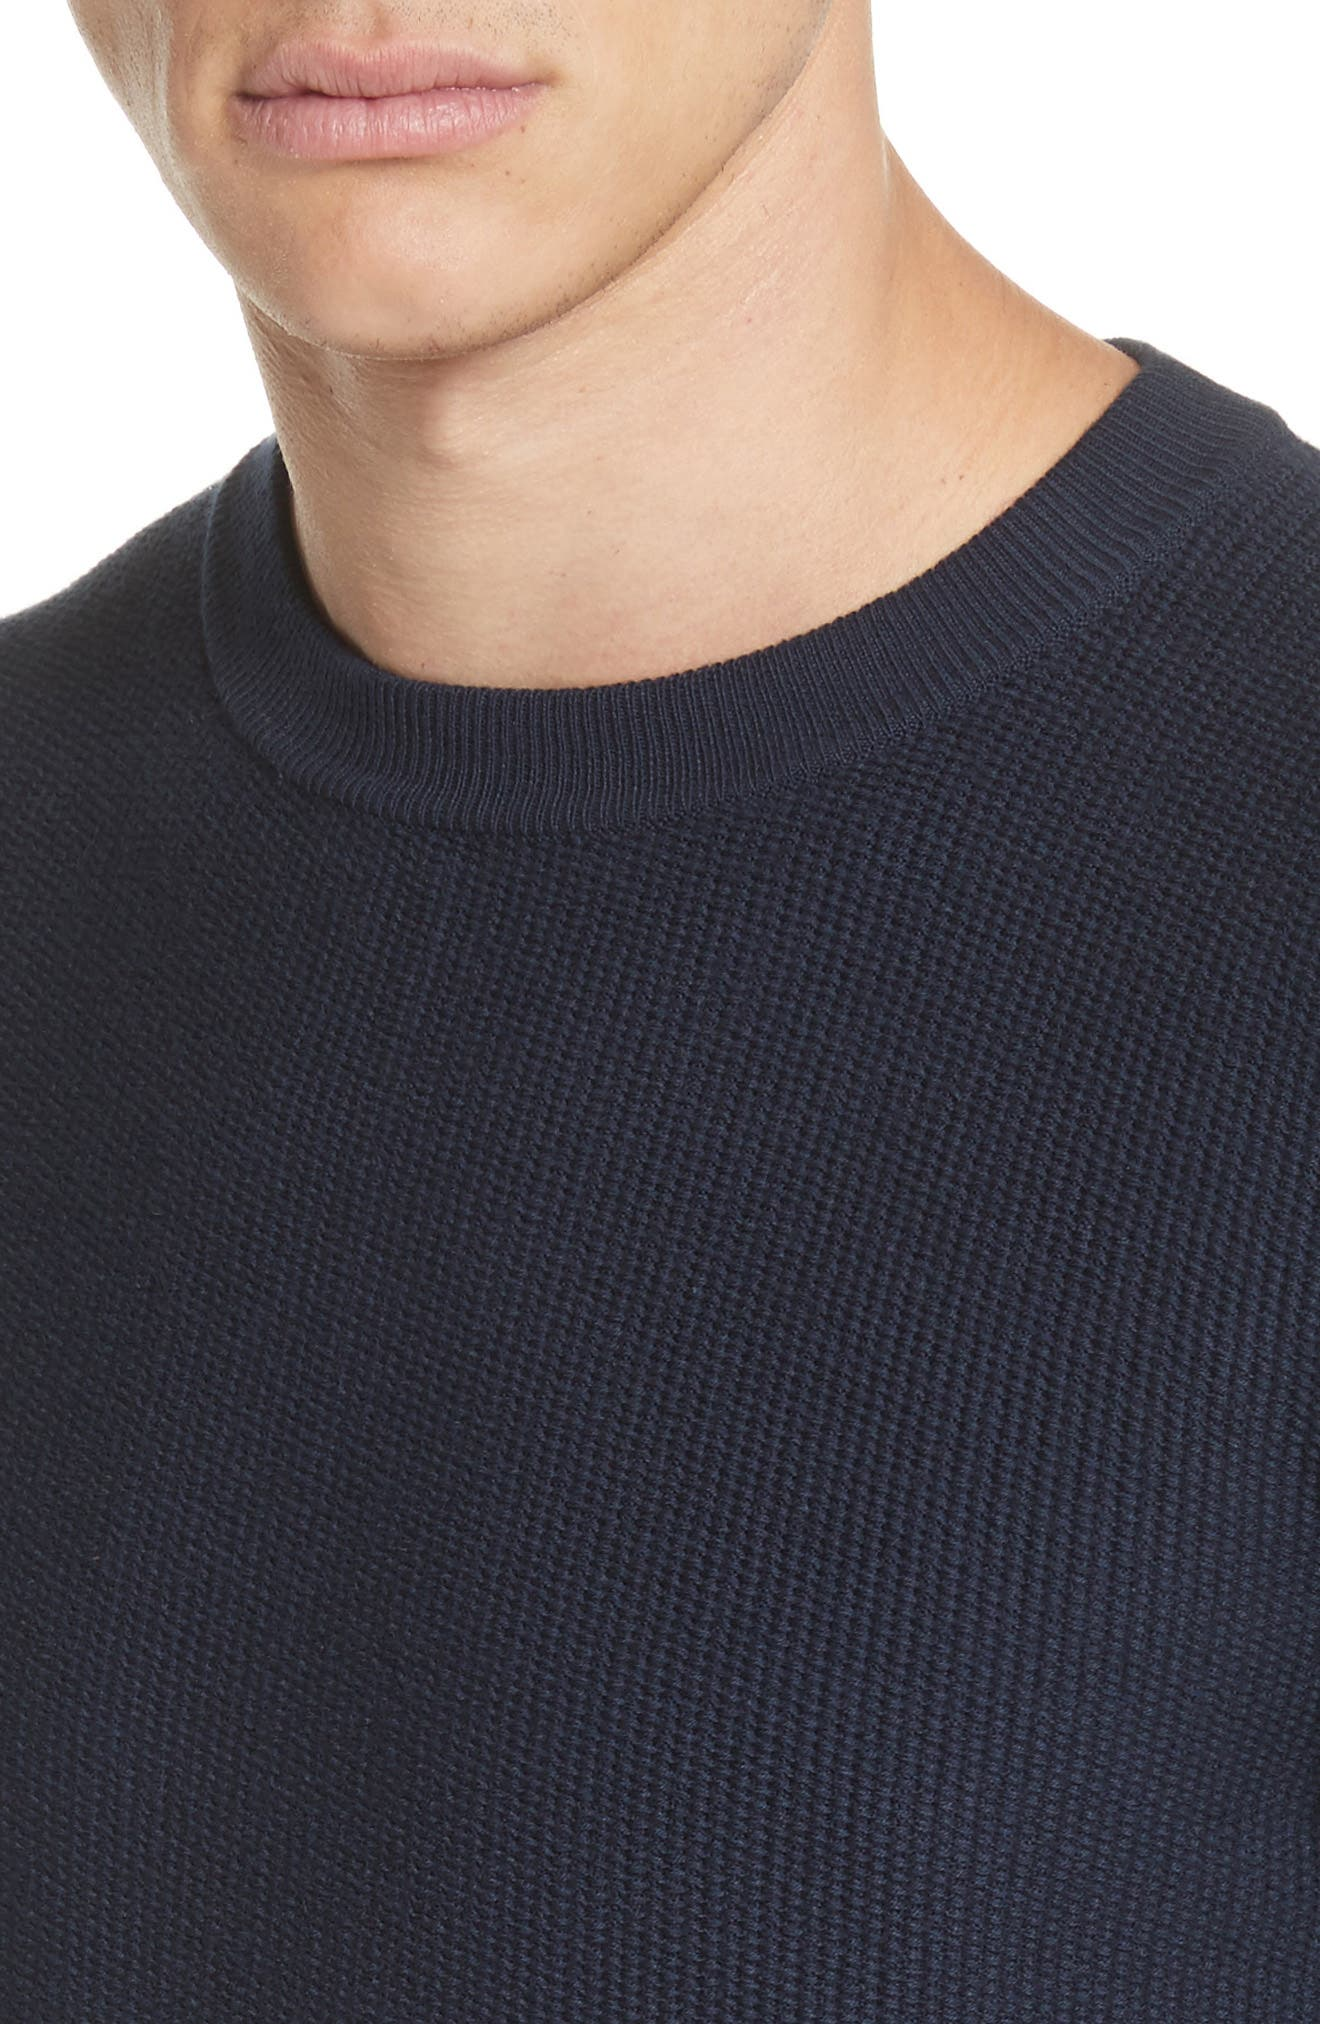 Marvin Crewneck Sweater,                             Alternate thumbnail 4, color,                             410